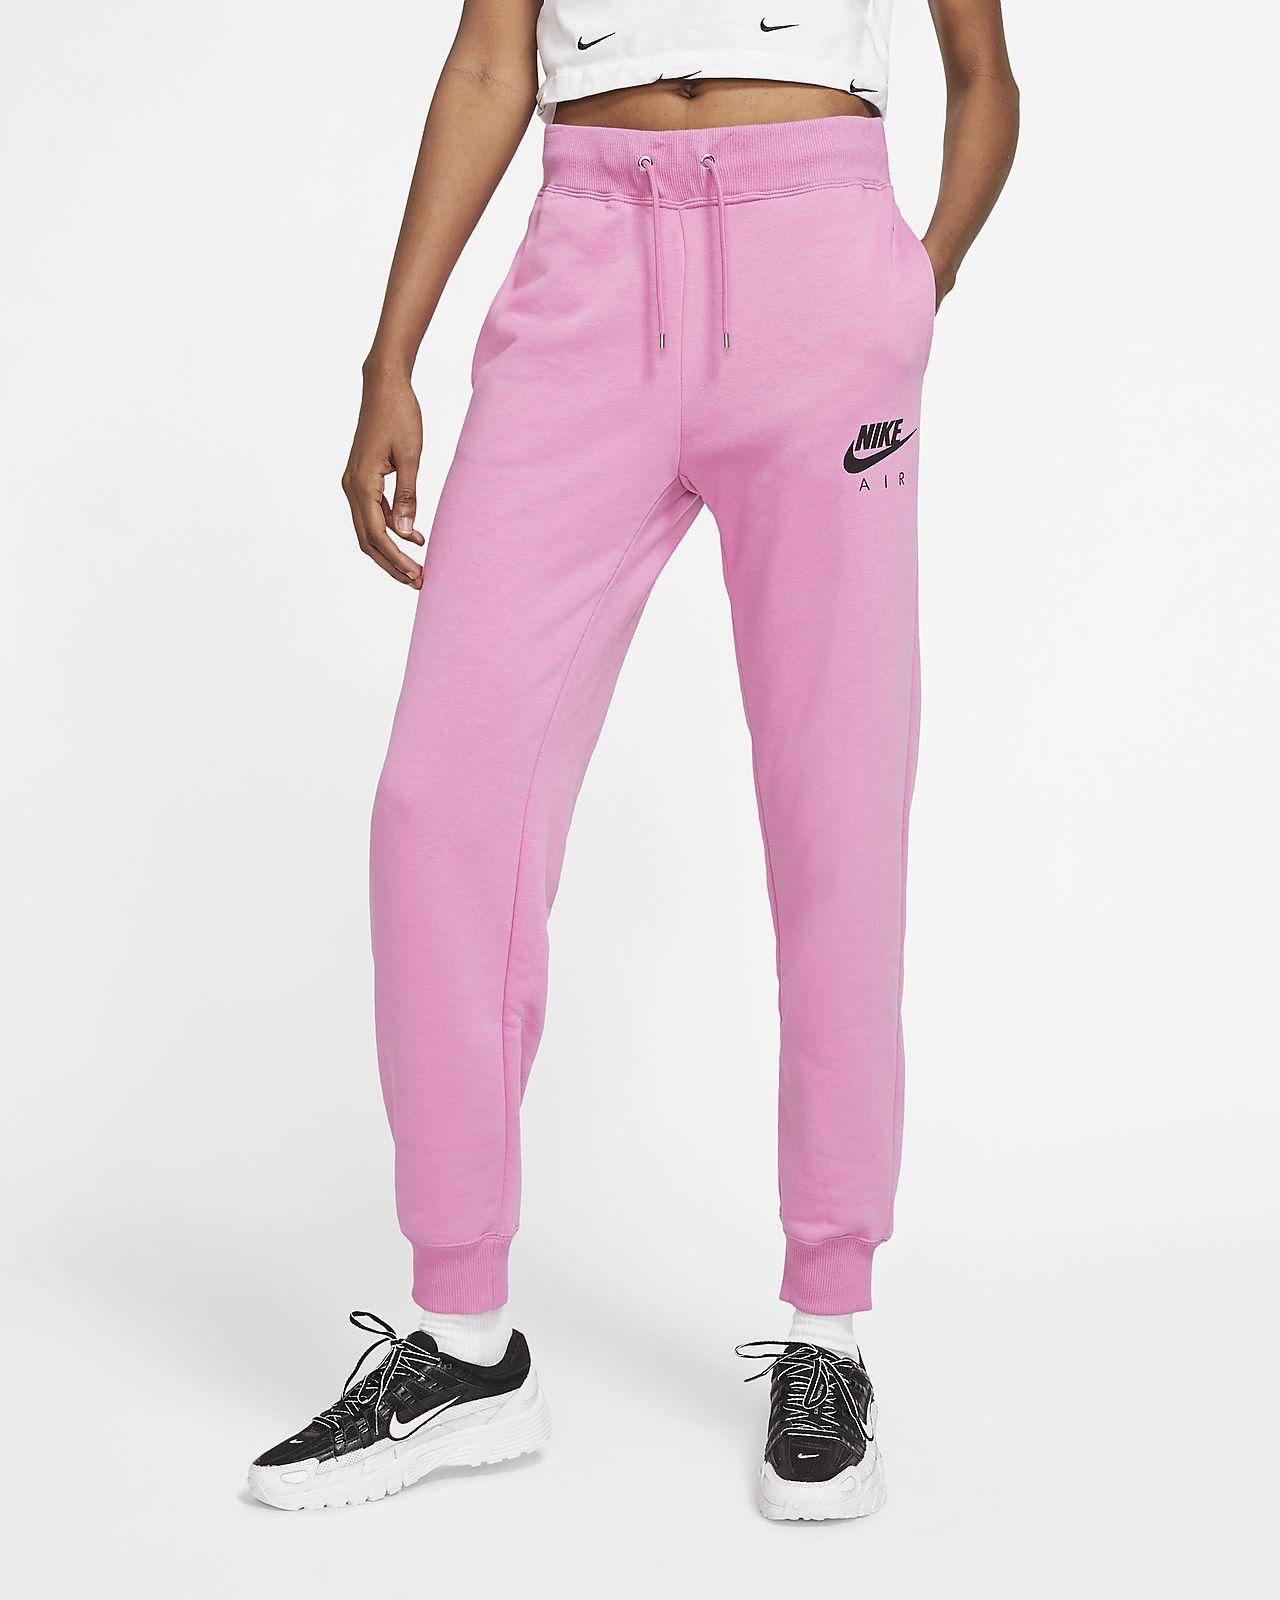 Pantalon en tissu Fleece Nike Air pour Femme